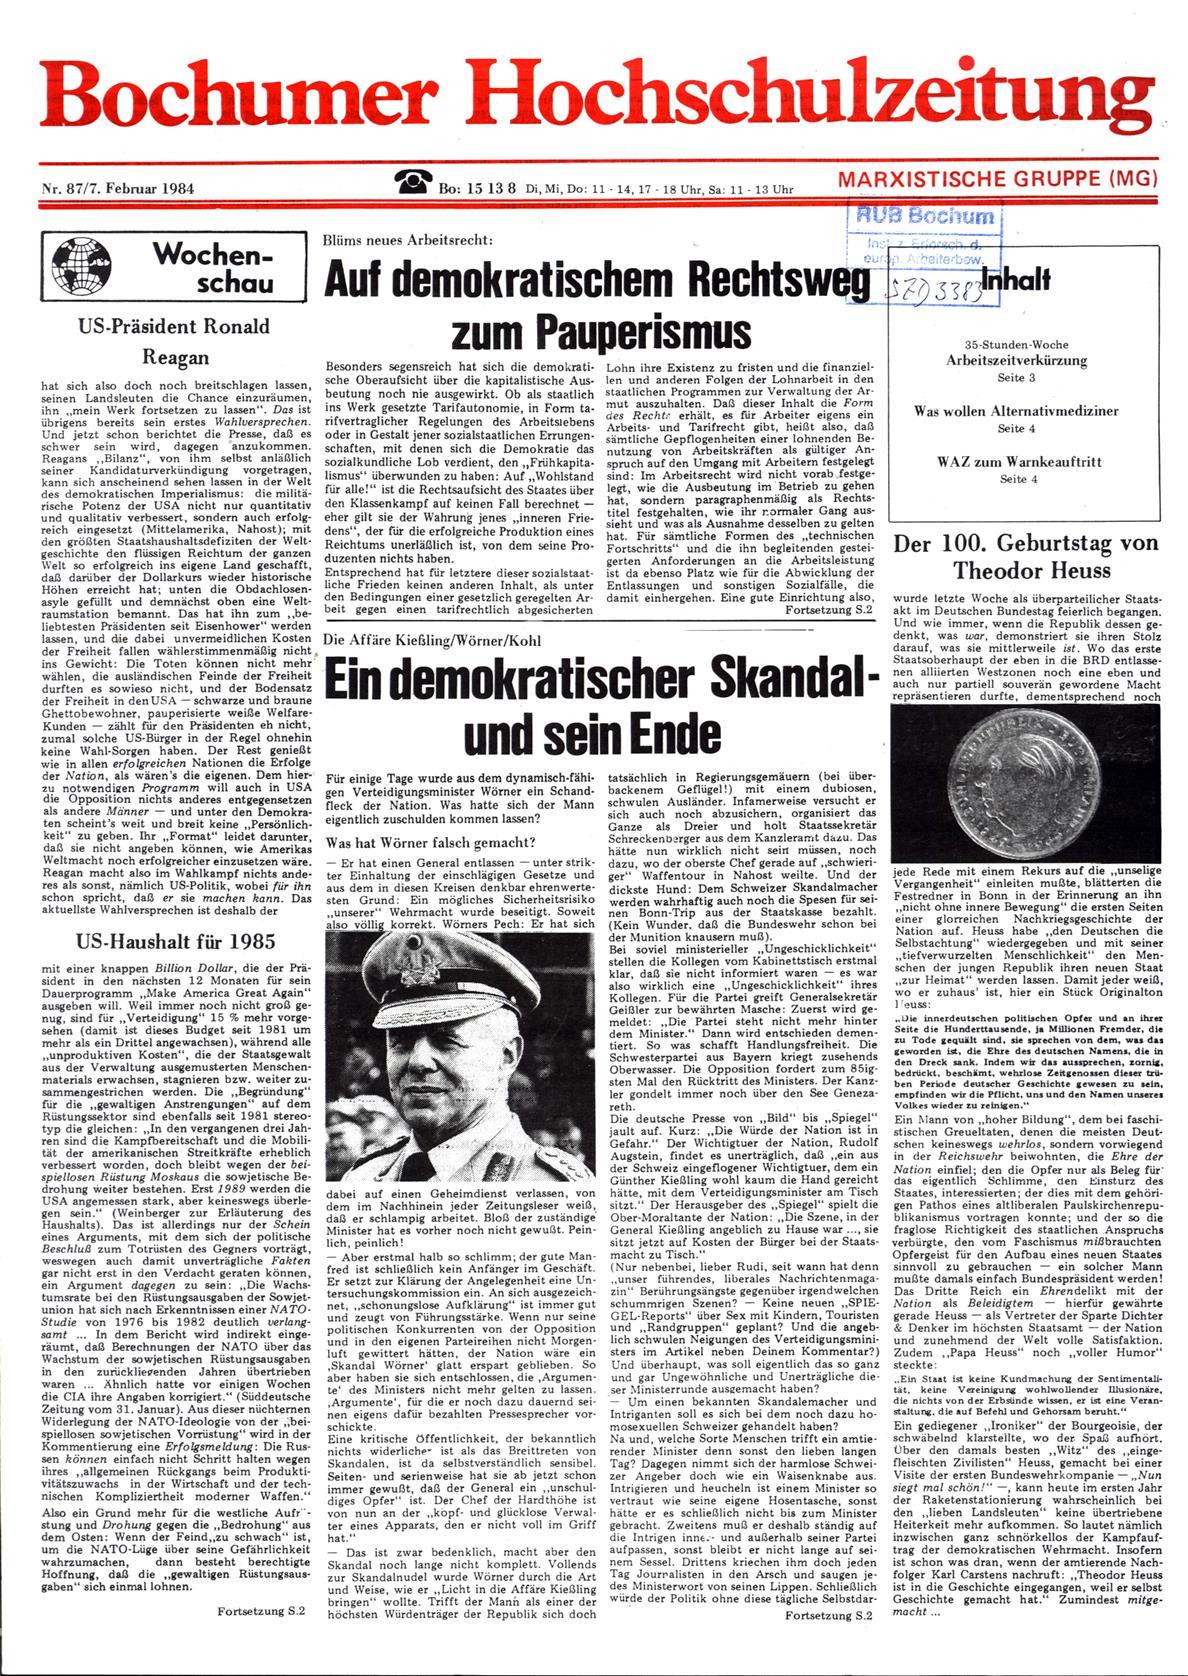 Bochum_BHZ_19840207_087_001